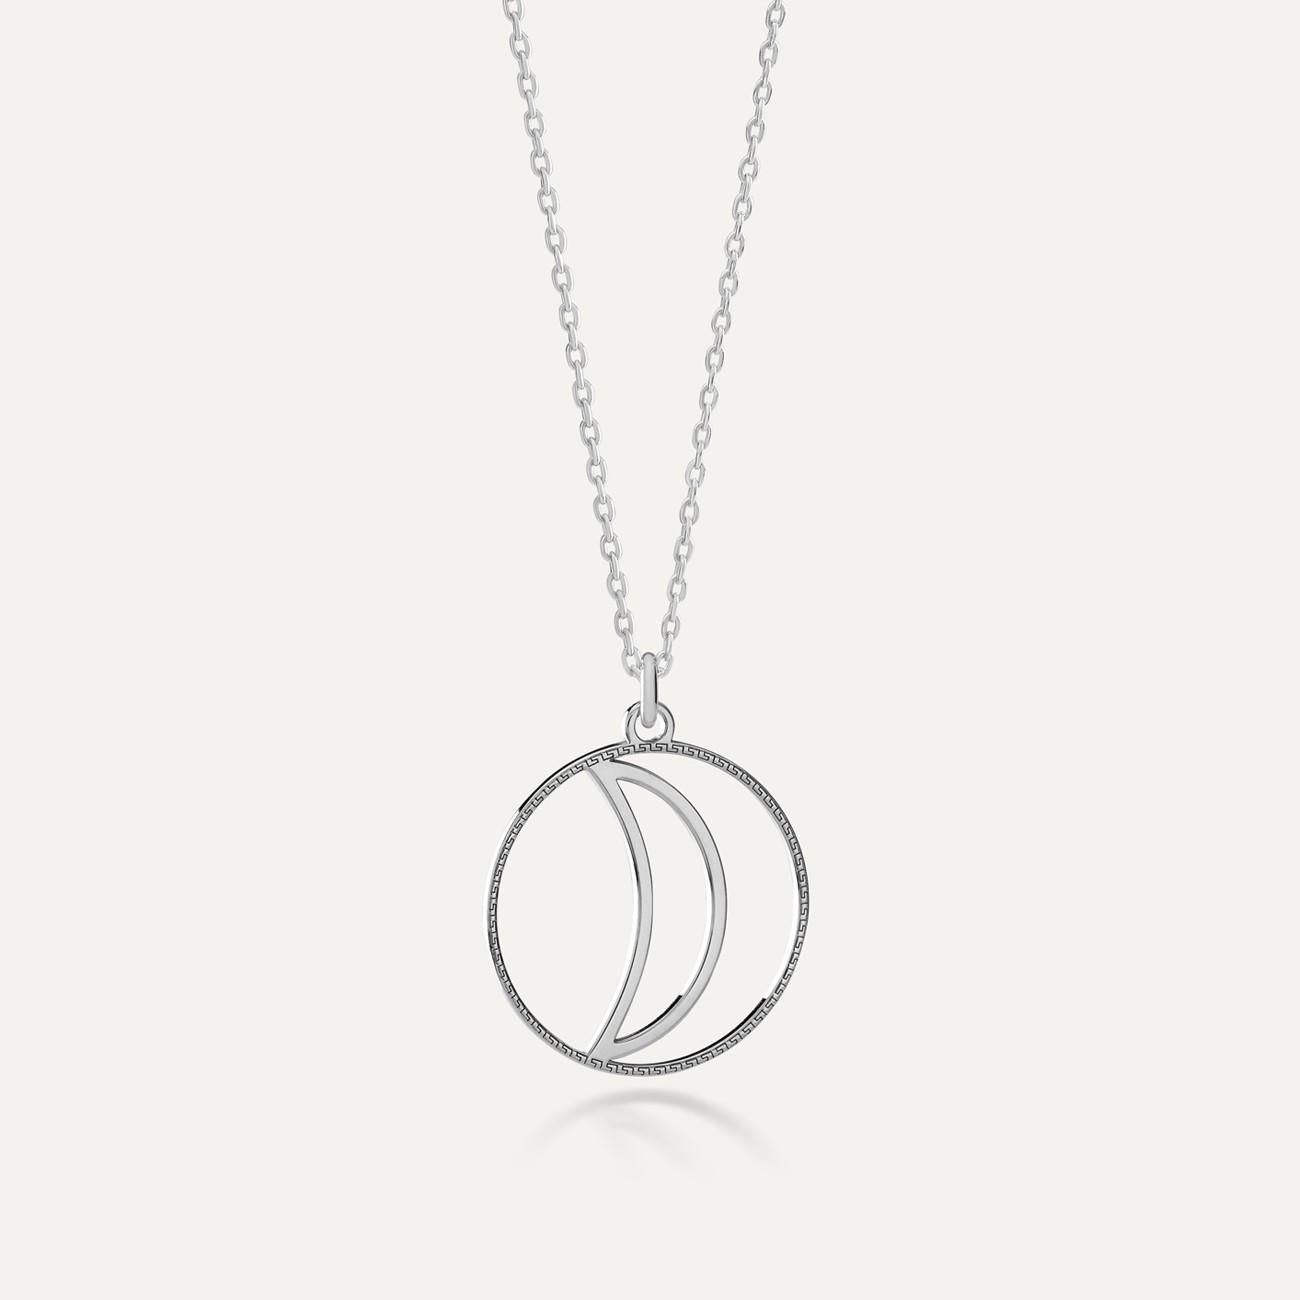 Srebrny naszyjnik bogowie greccy - Artemida MON DÉFI